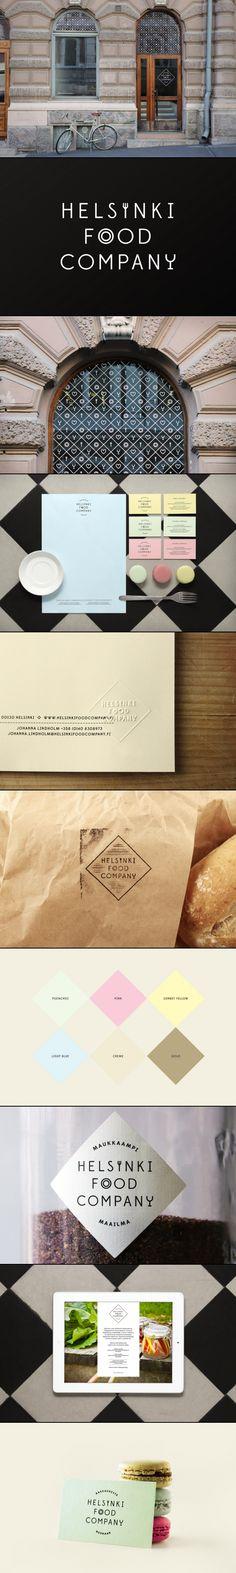 Helsinki Food Company /Werklig